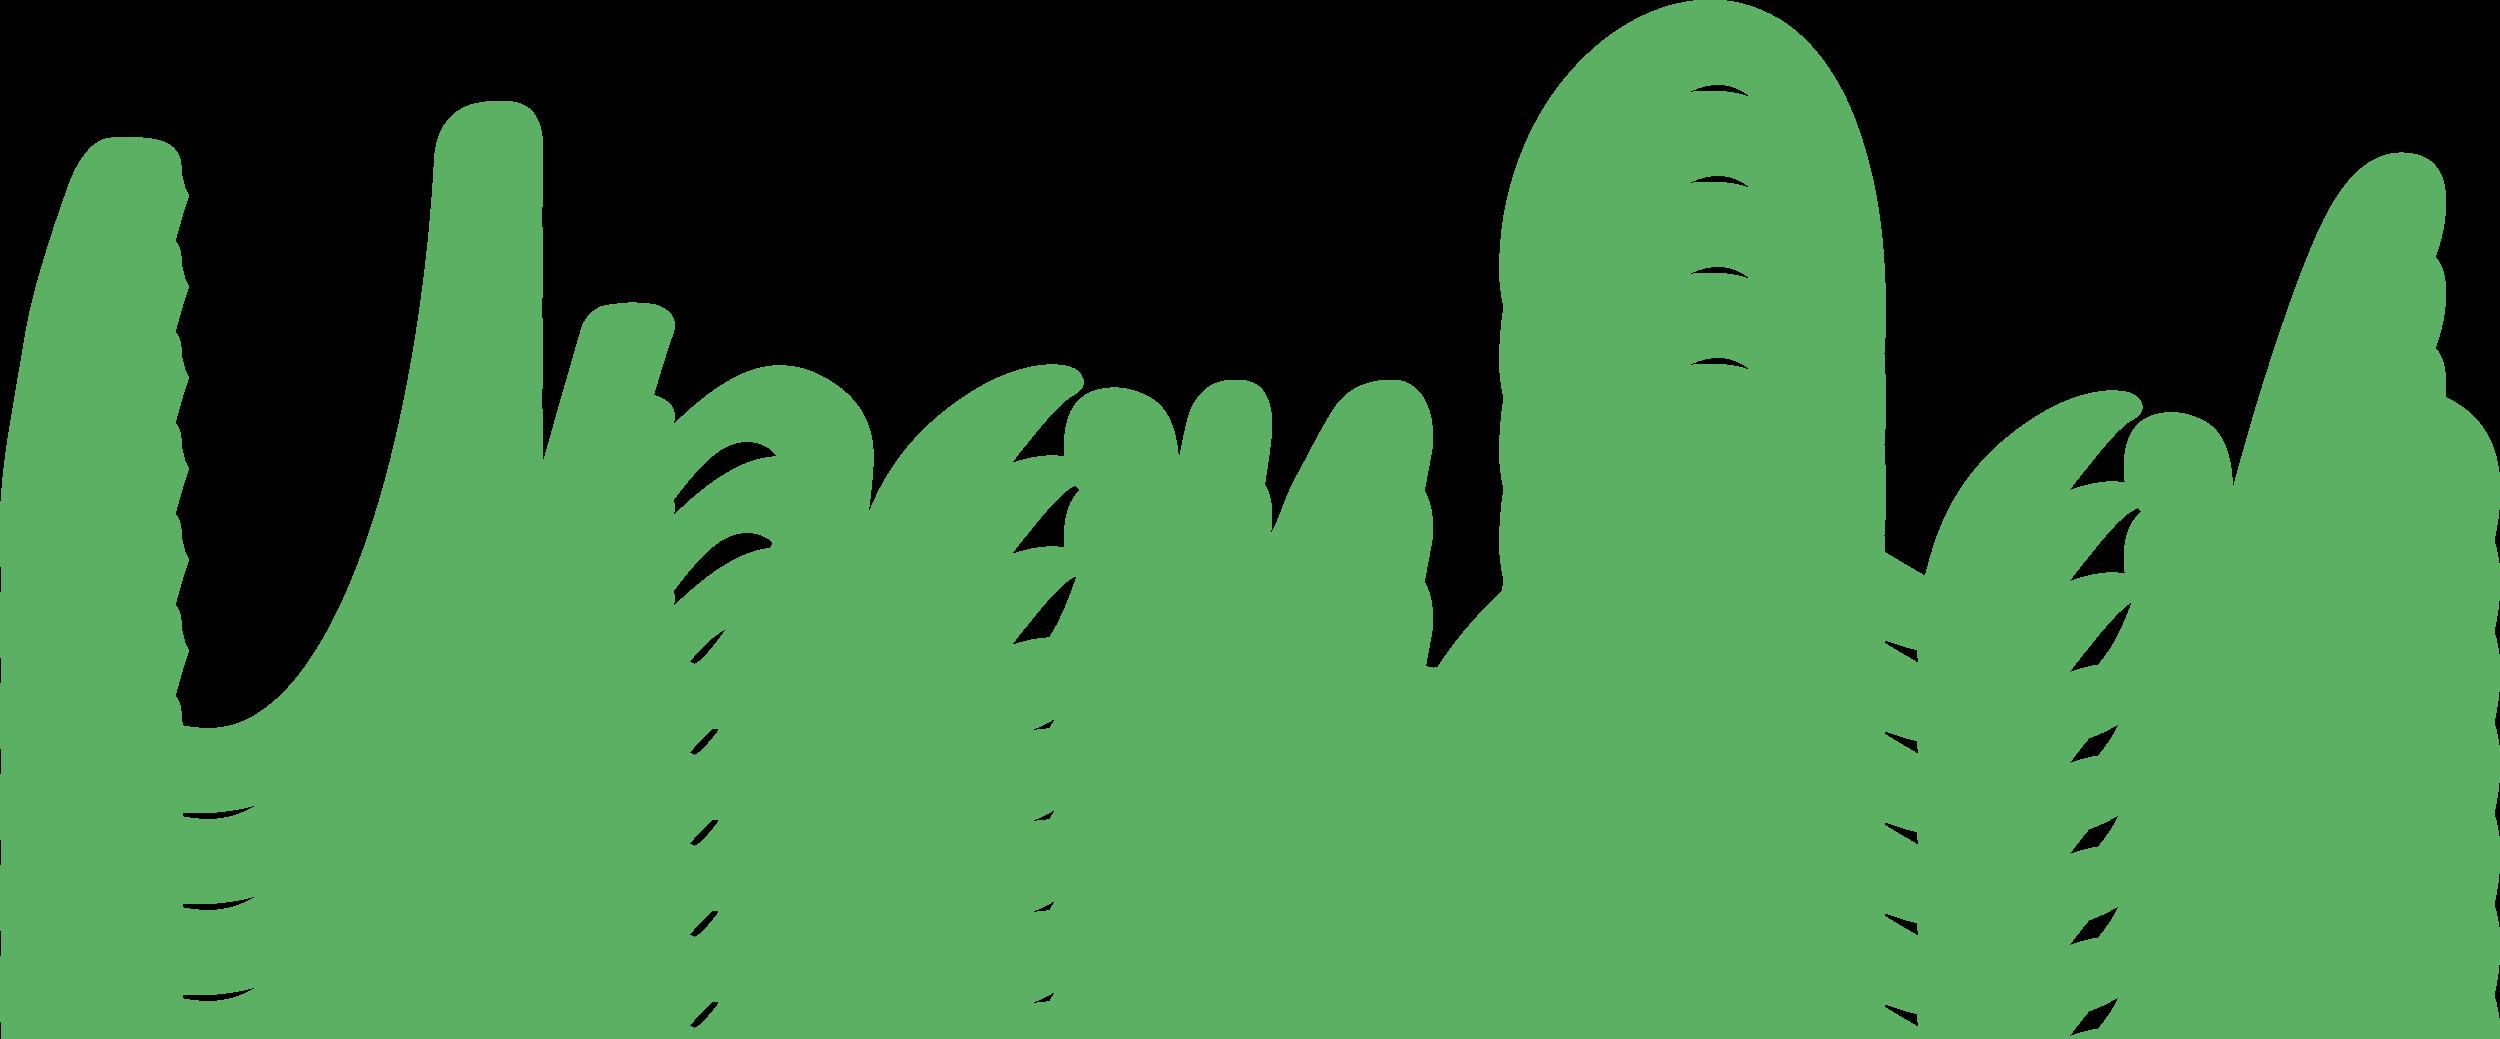 eewee-saas-uponjob-logo